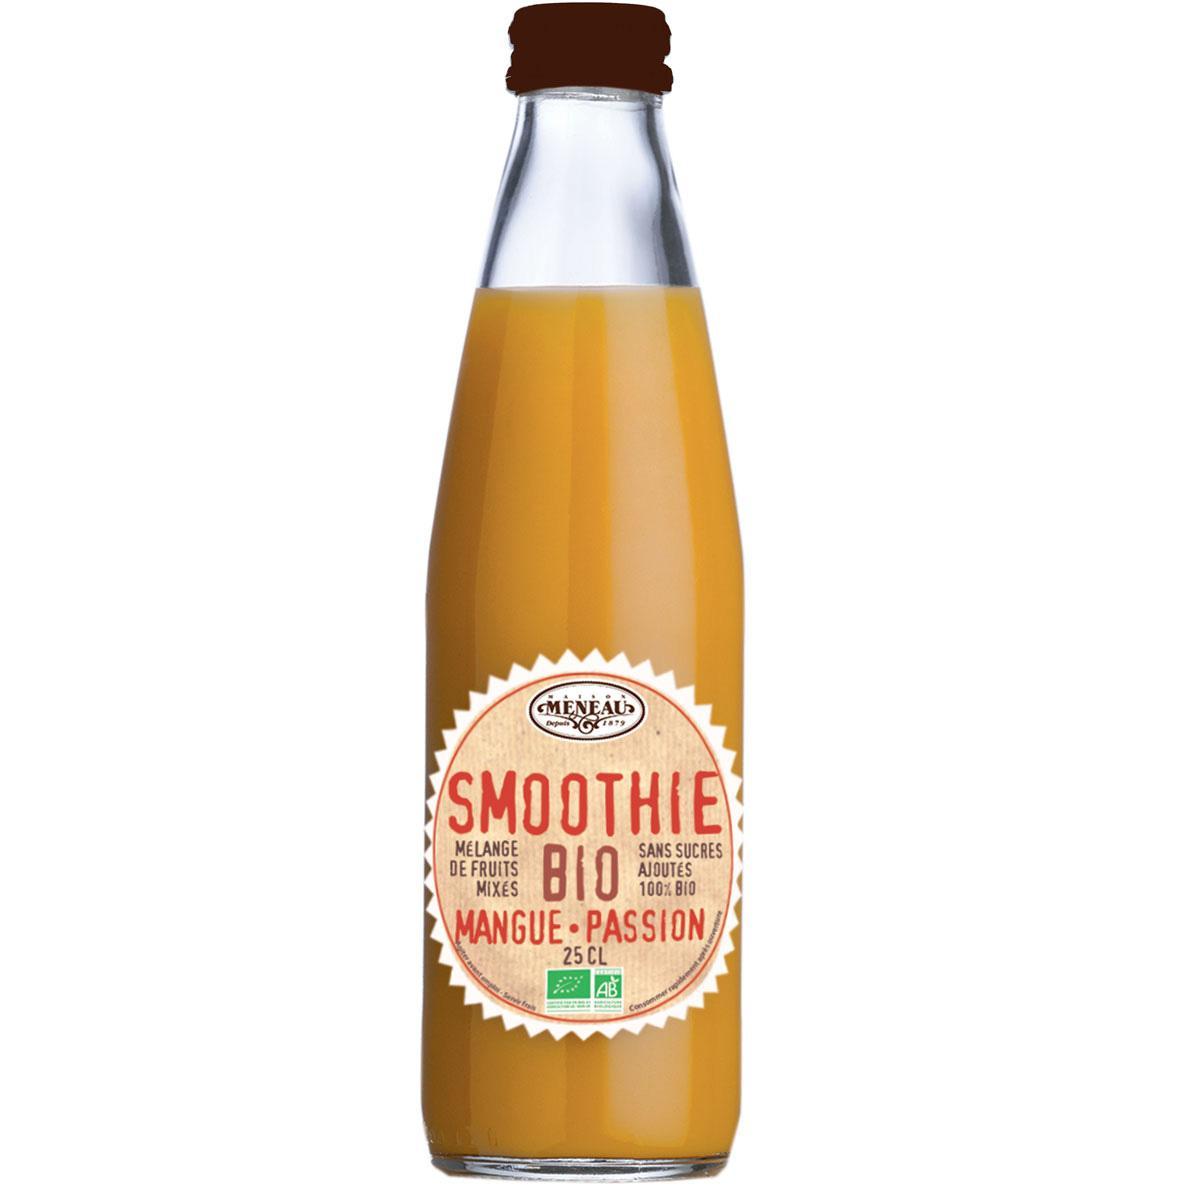 img-maison-meneau-smoothie-mangue-passion-bio-0-25l